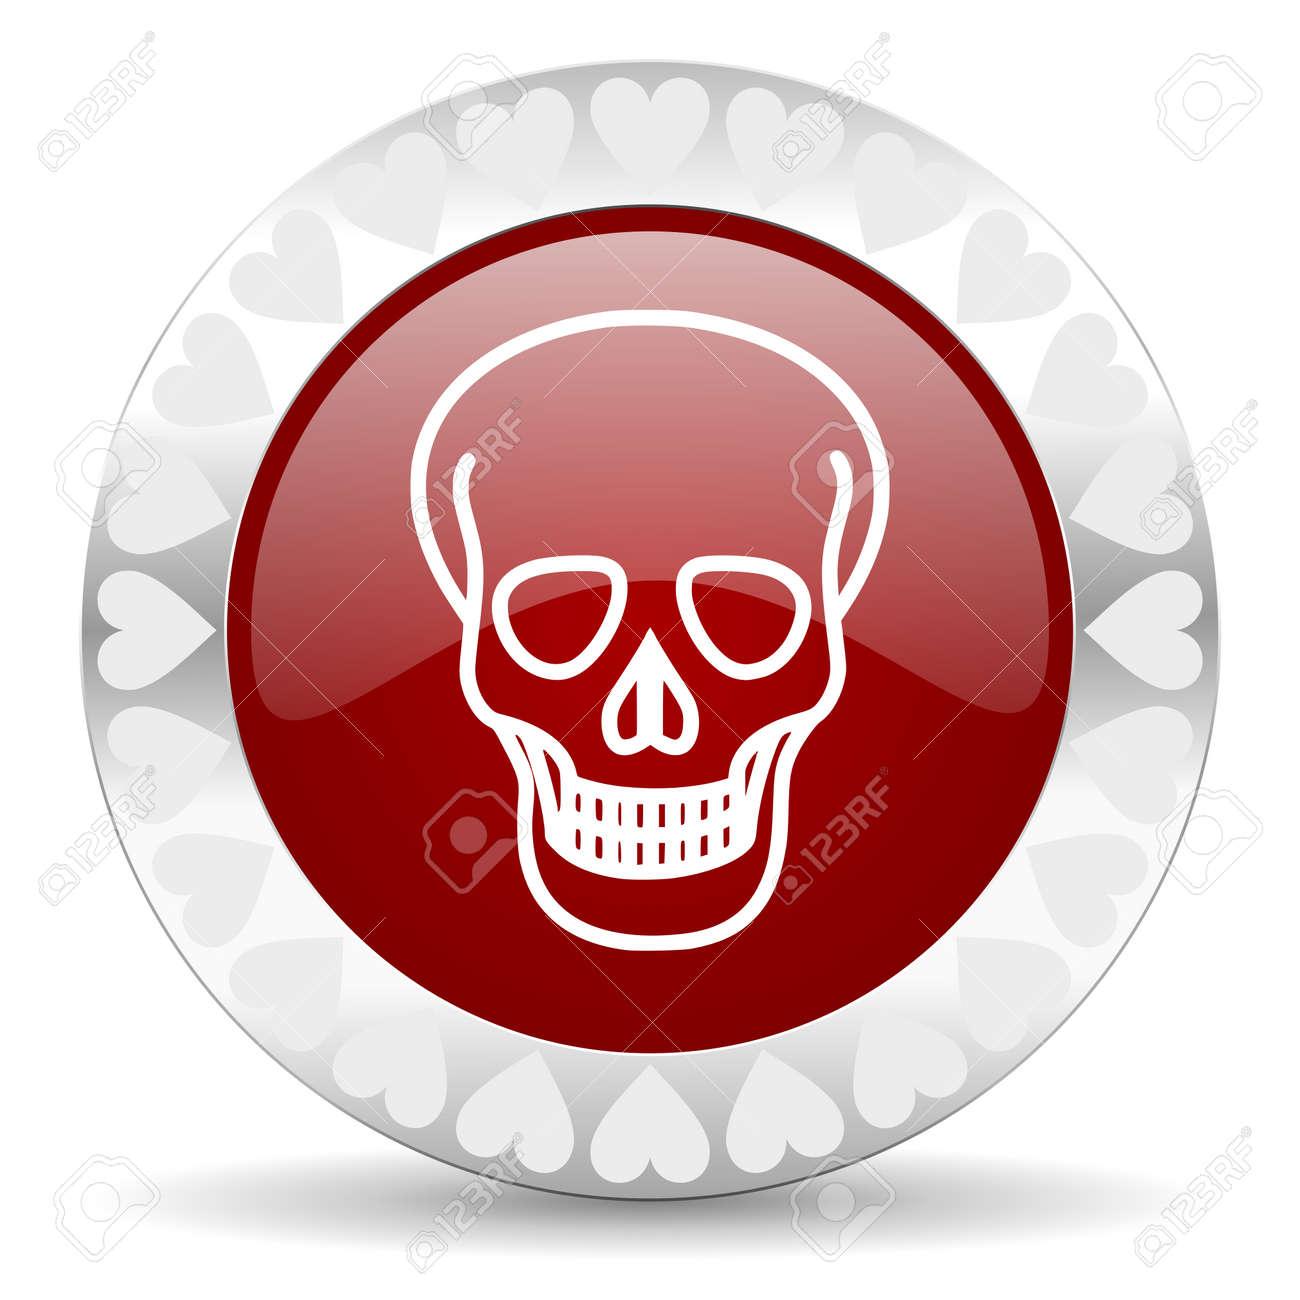 web button Stock Photo - 25572975